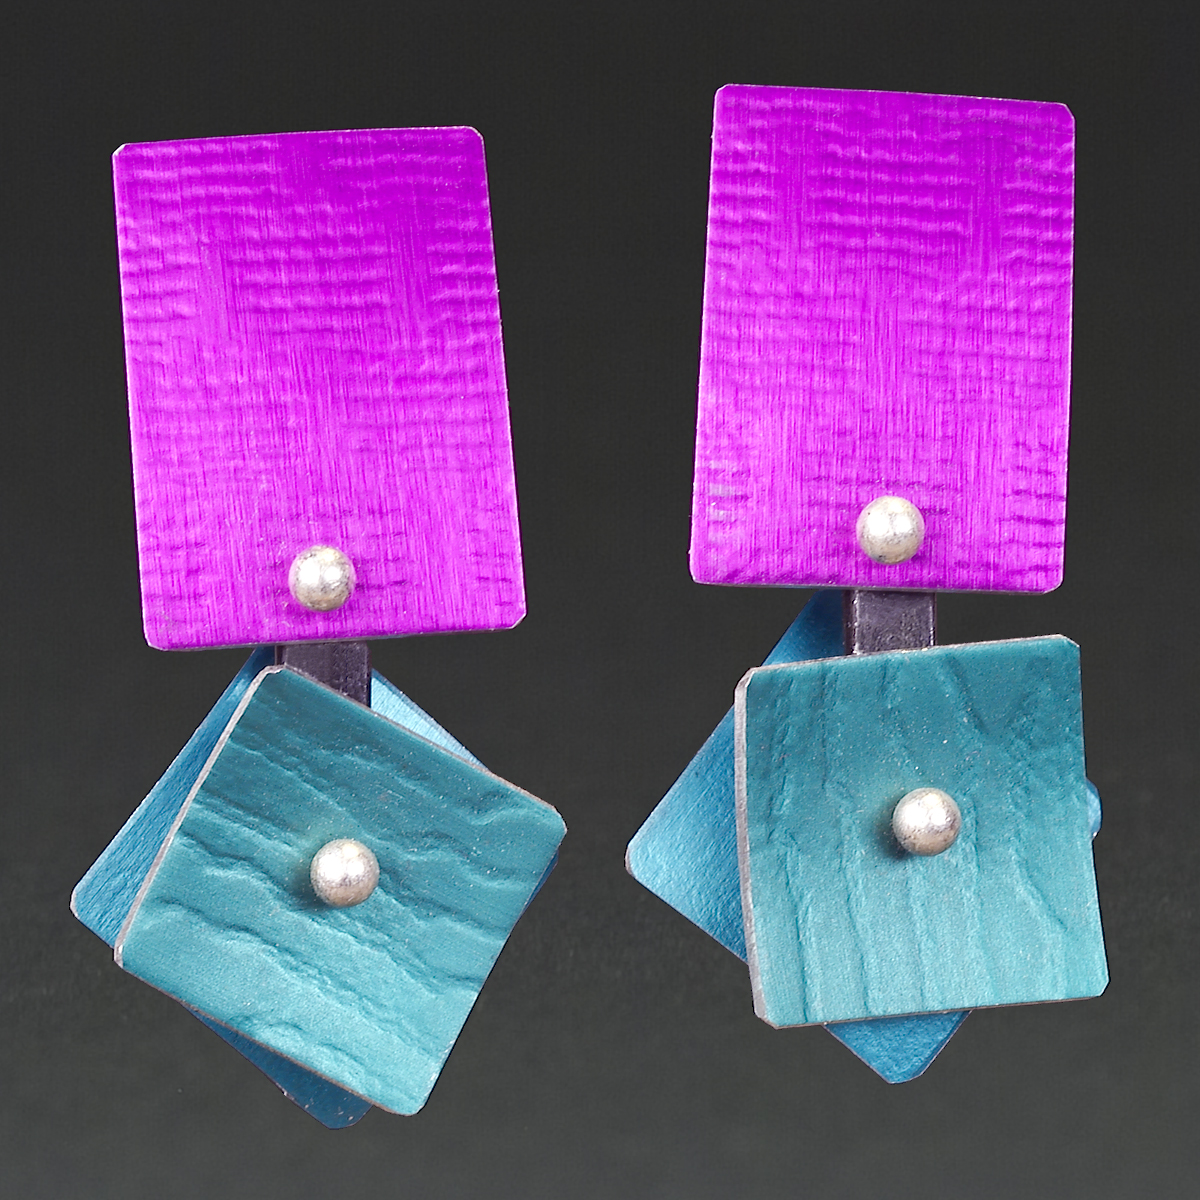 A - Violet, Aqua, Turquoise